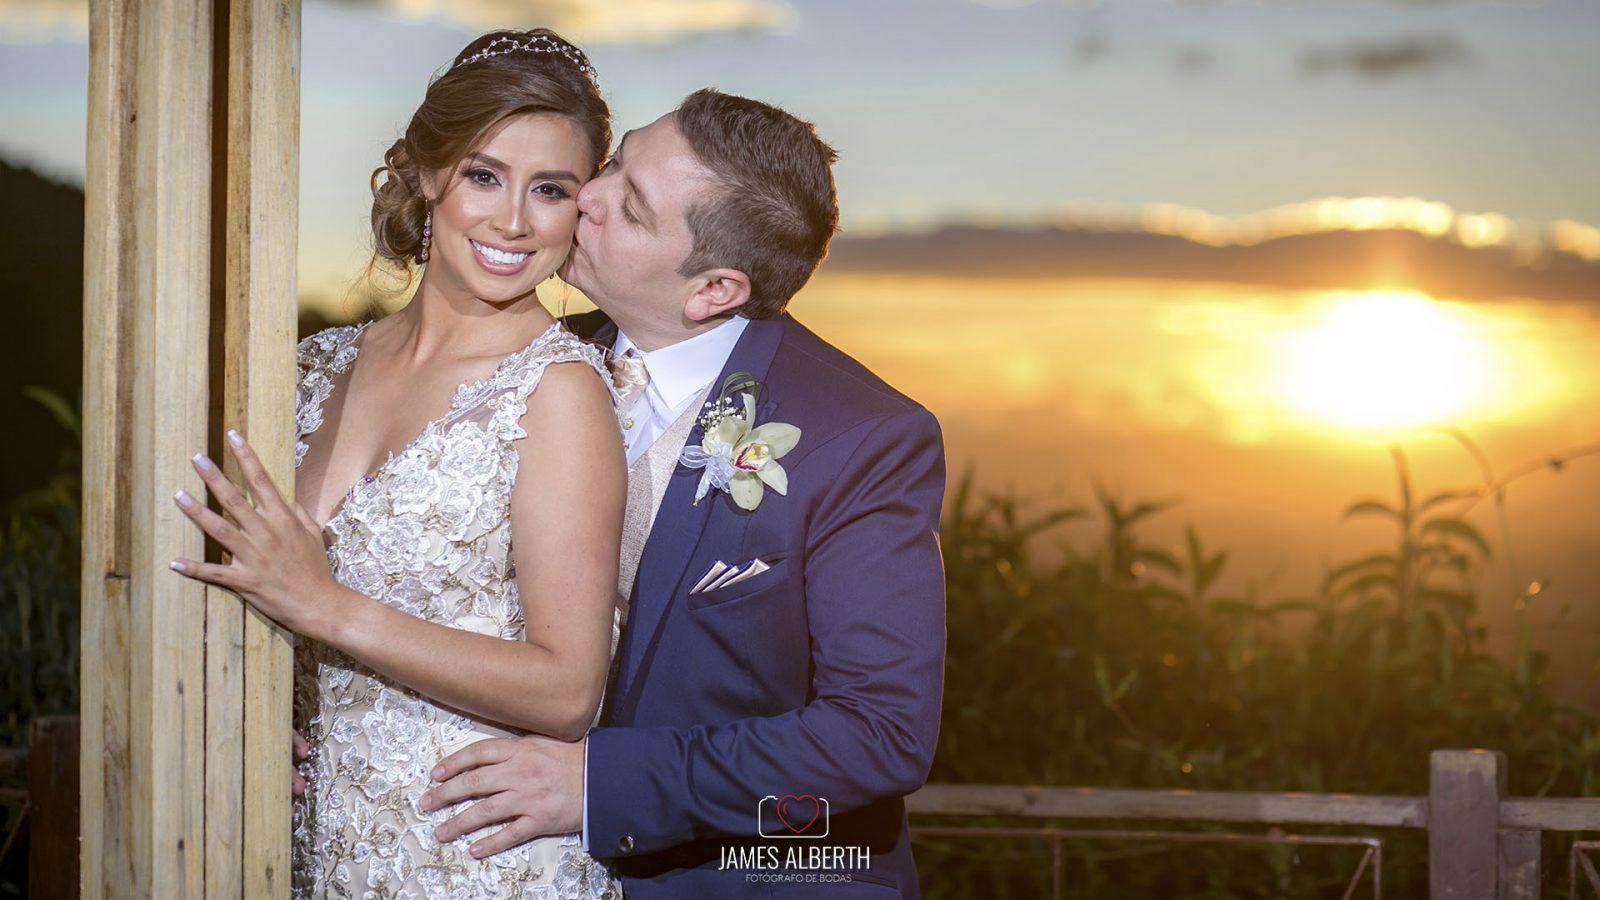 Matrimonio Catolico Votos : Renovacion de votos 10 años fotografias de bodas profesionales